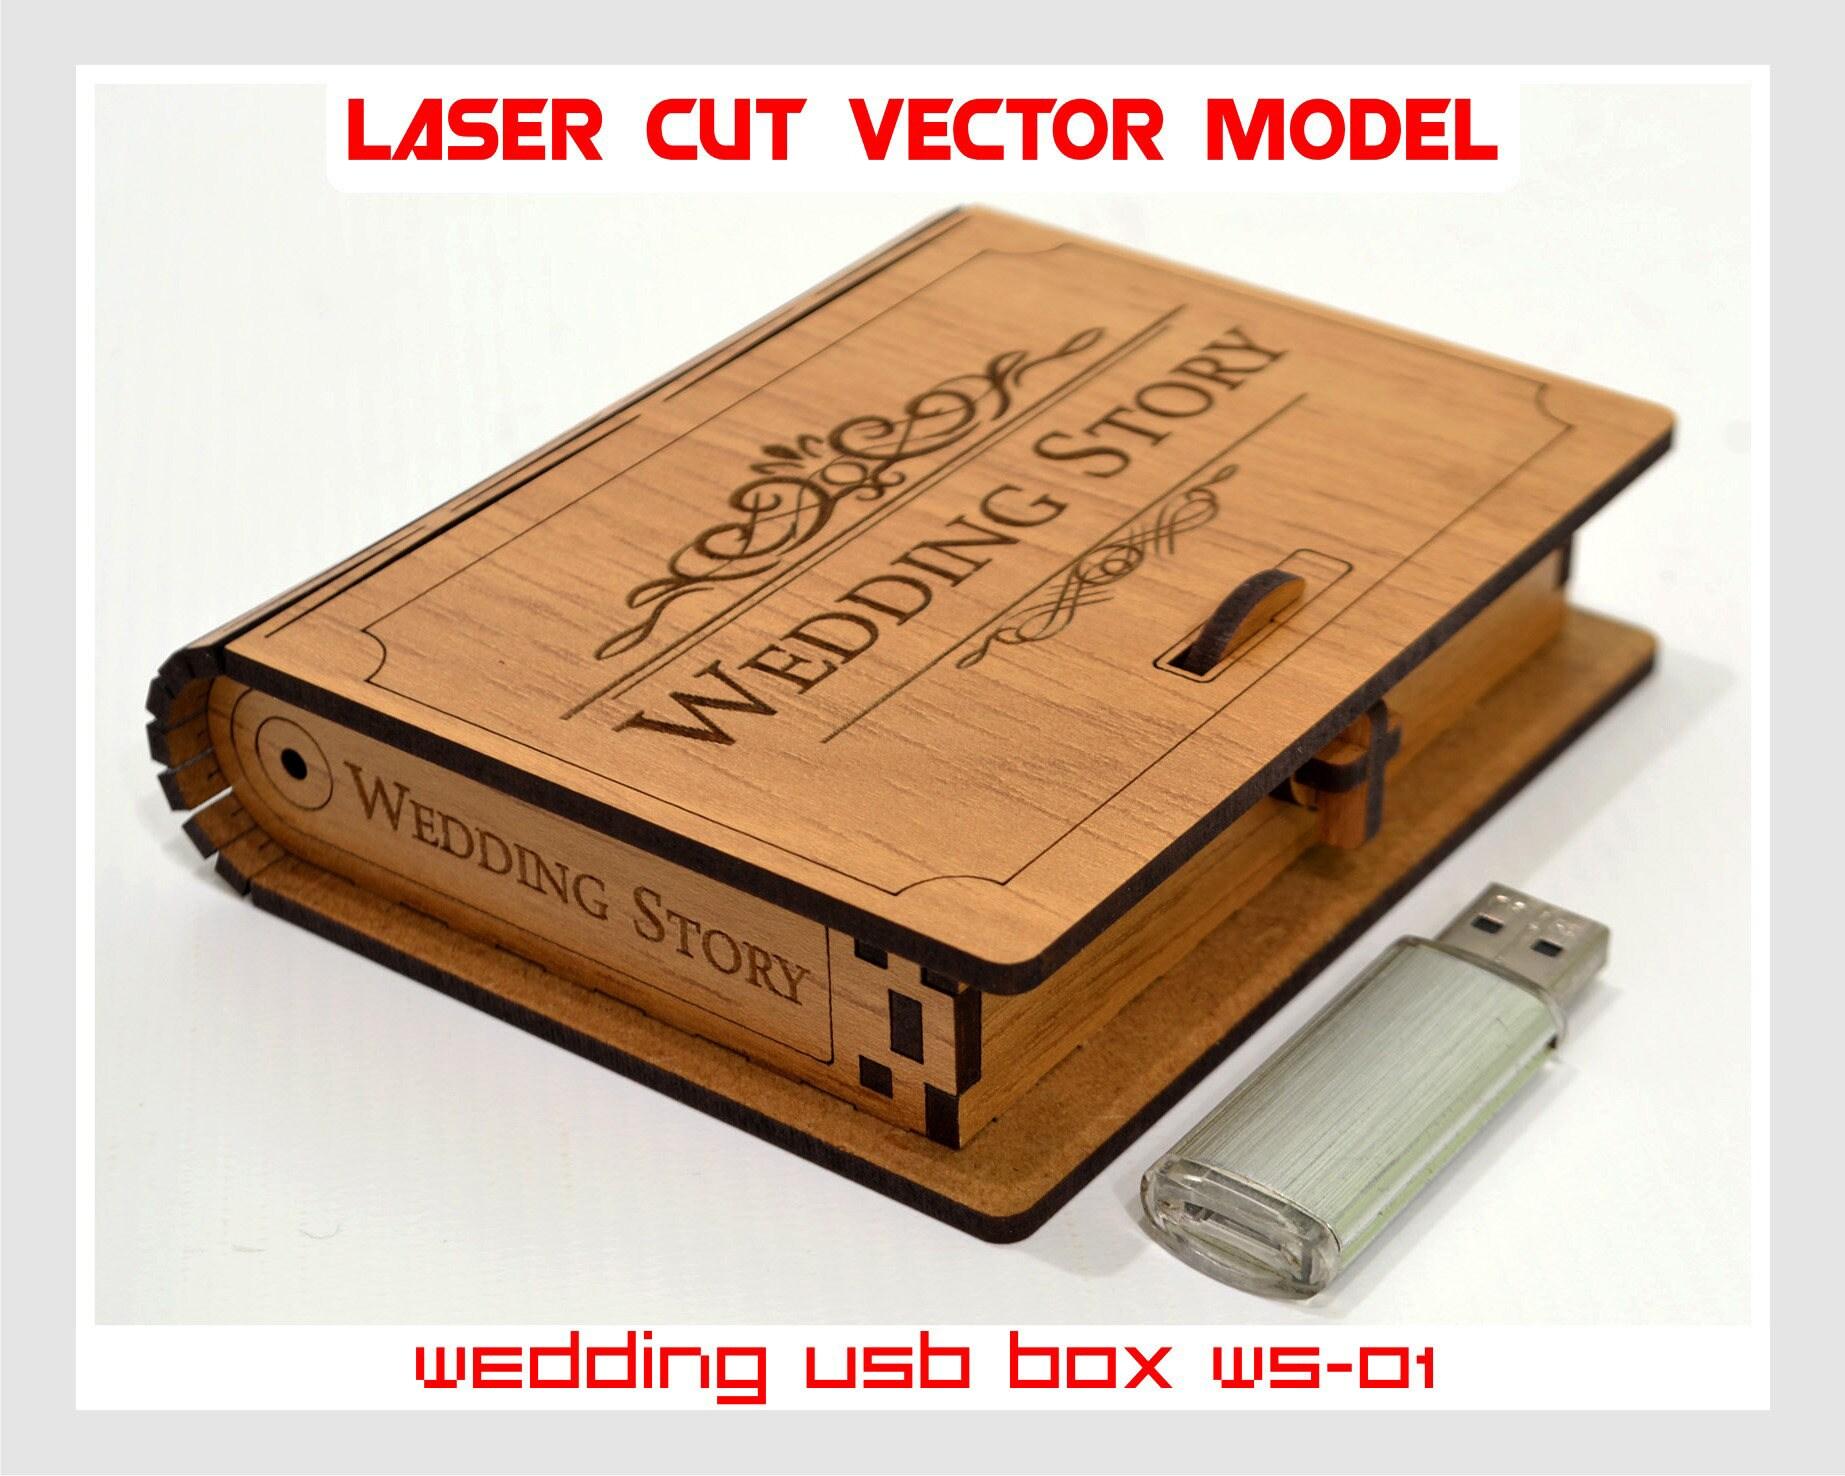 laser cut wood box template - wooden small box wedding usb case wedding usb box